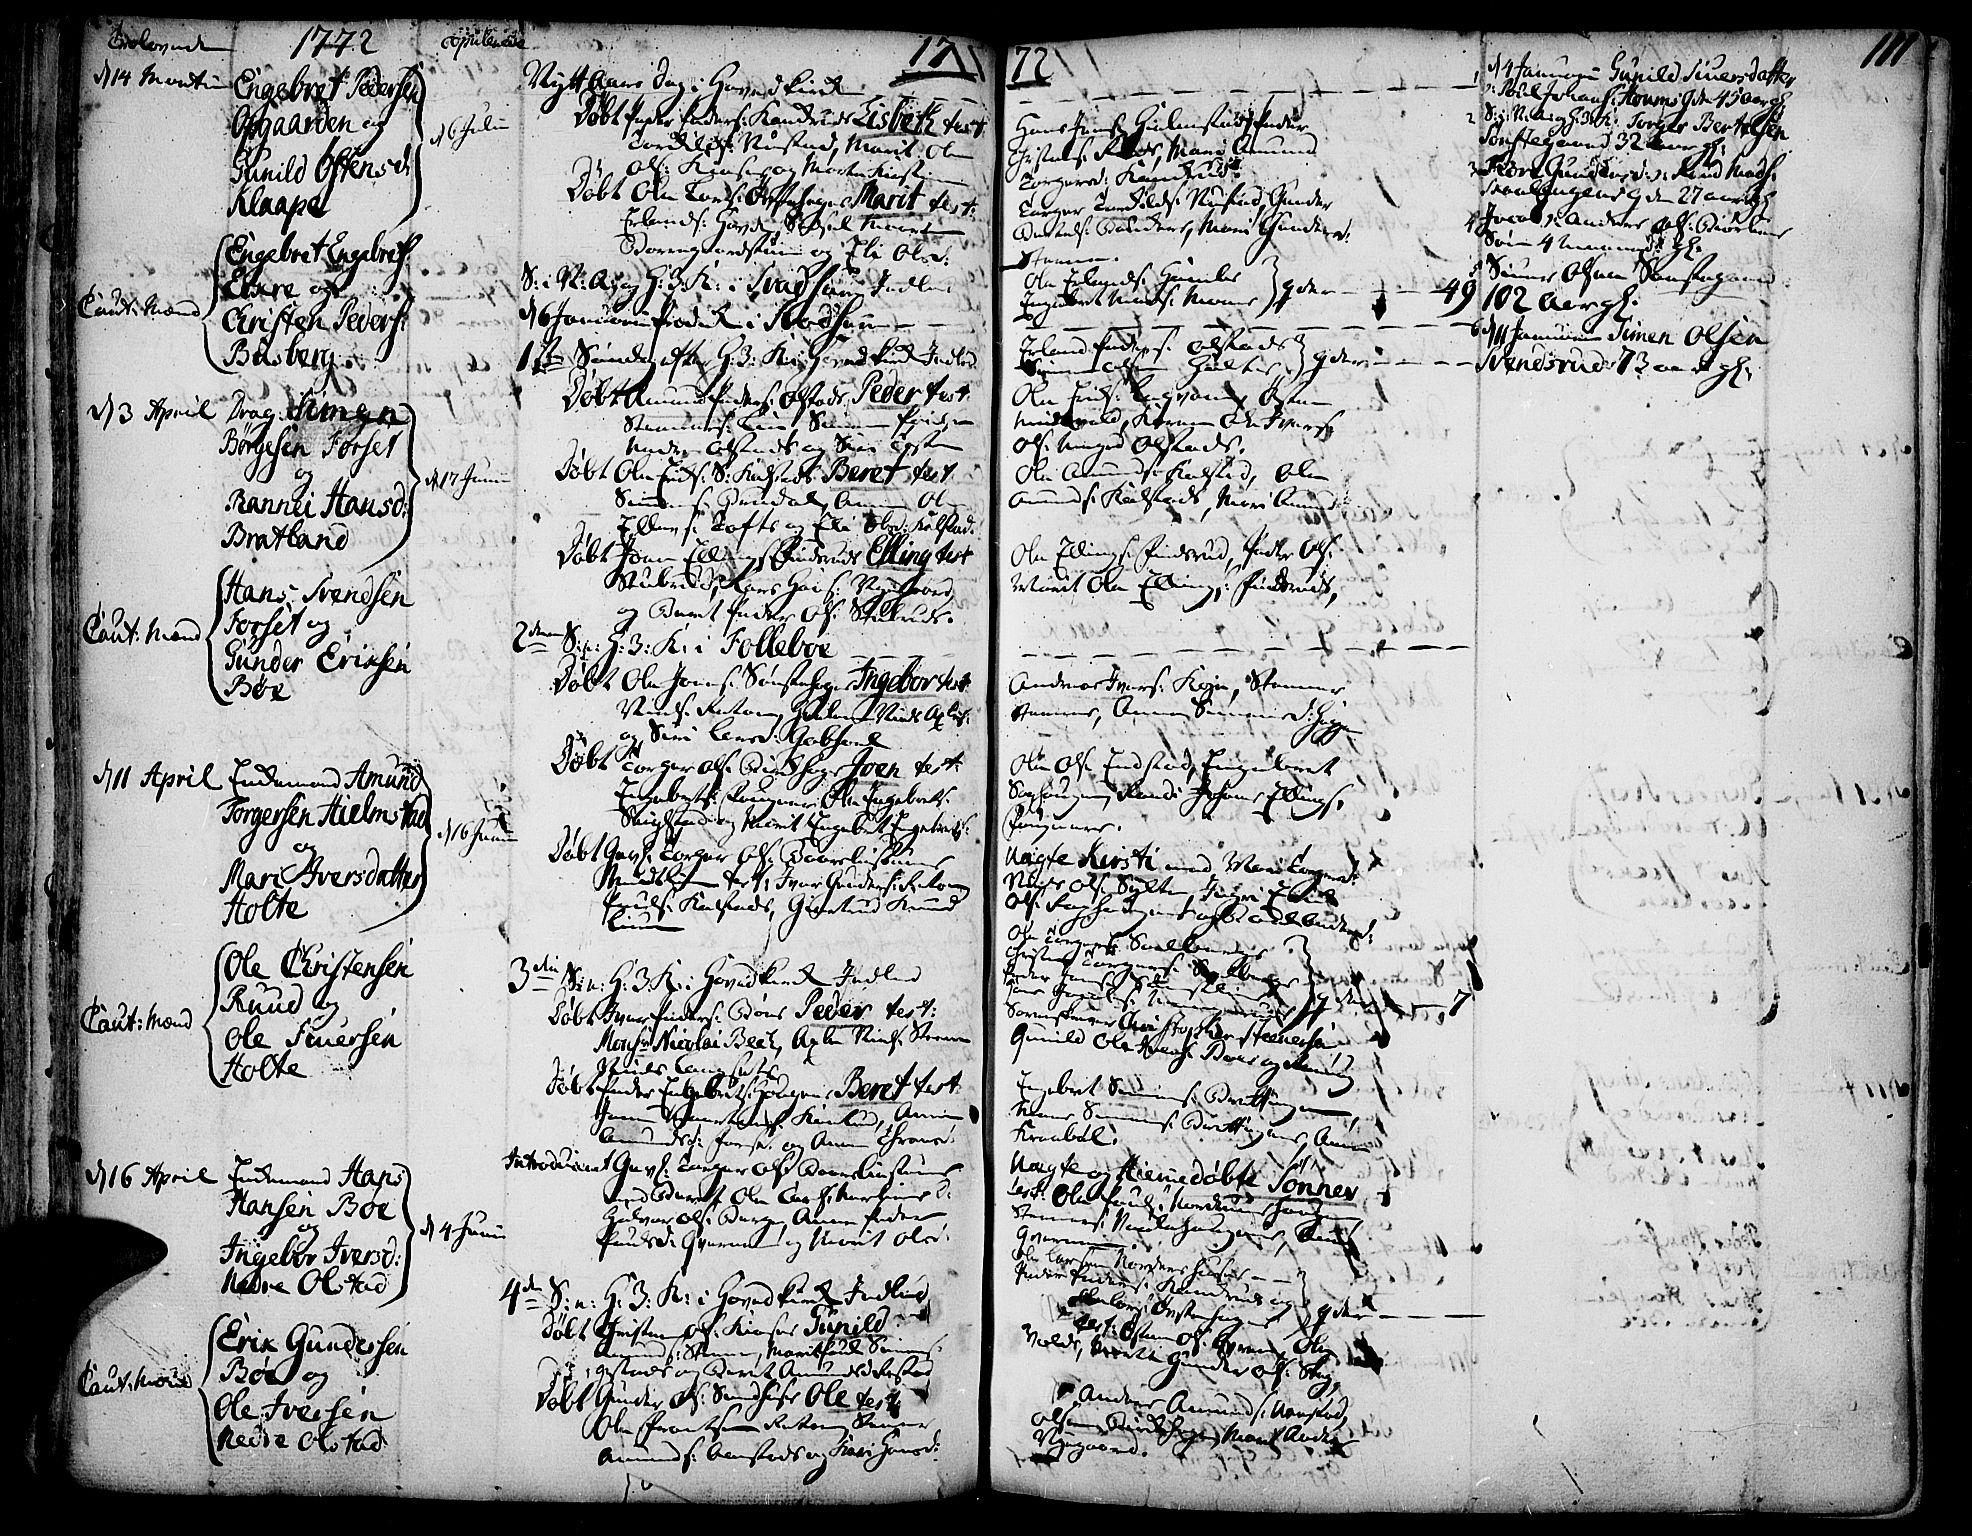 SAH, Gausdal prestekontor, Ministerialbok nr. 3, 1758-1809, s. 111